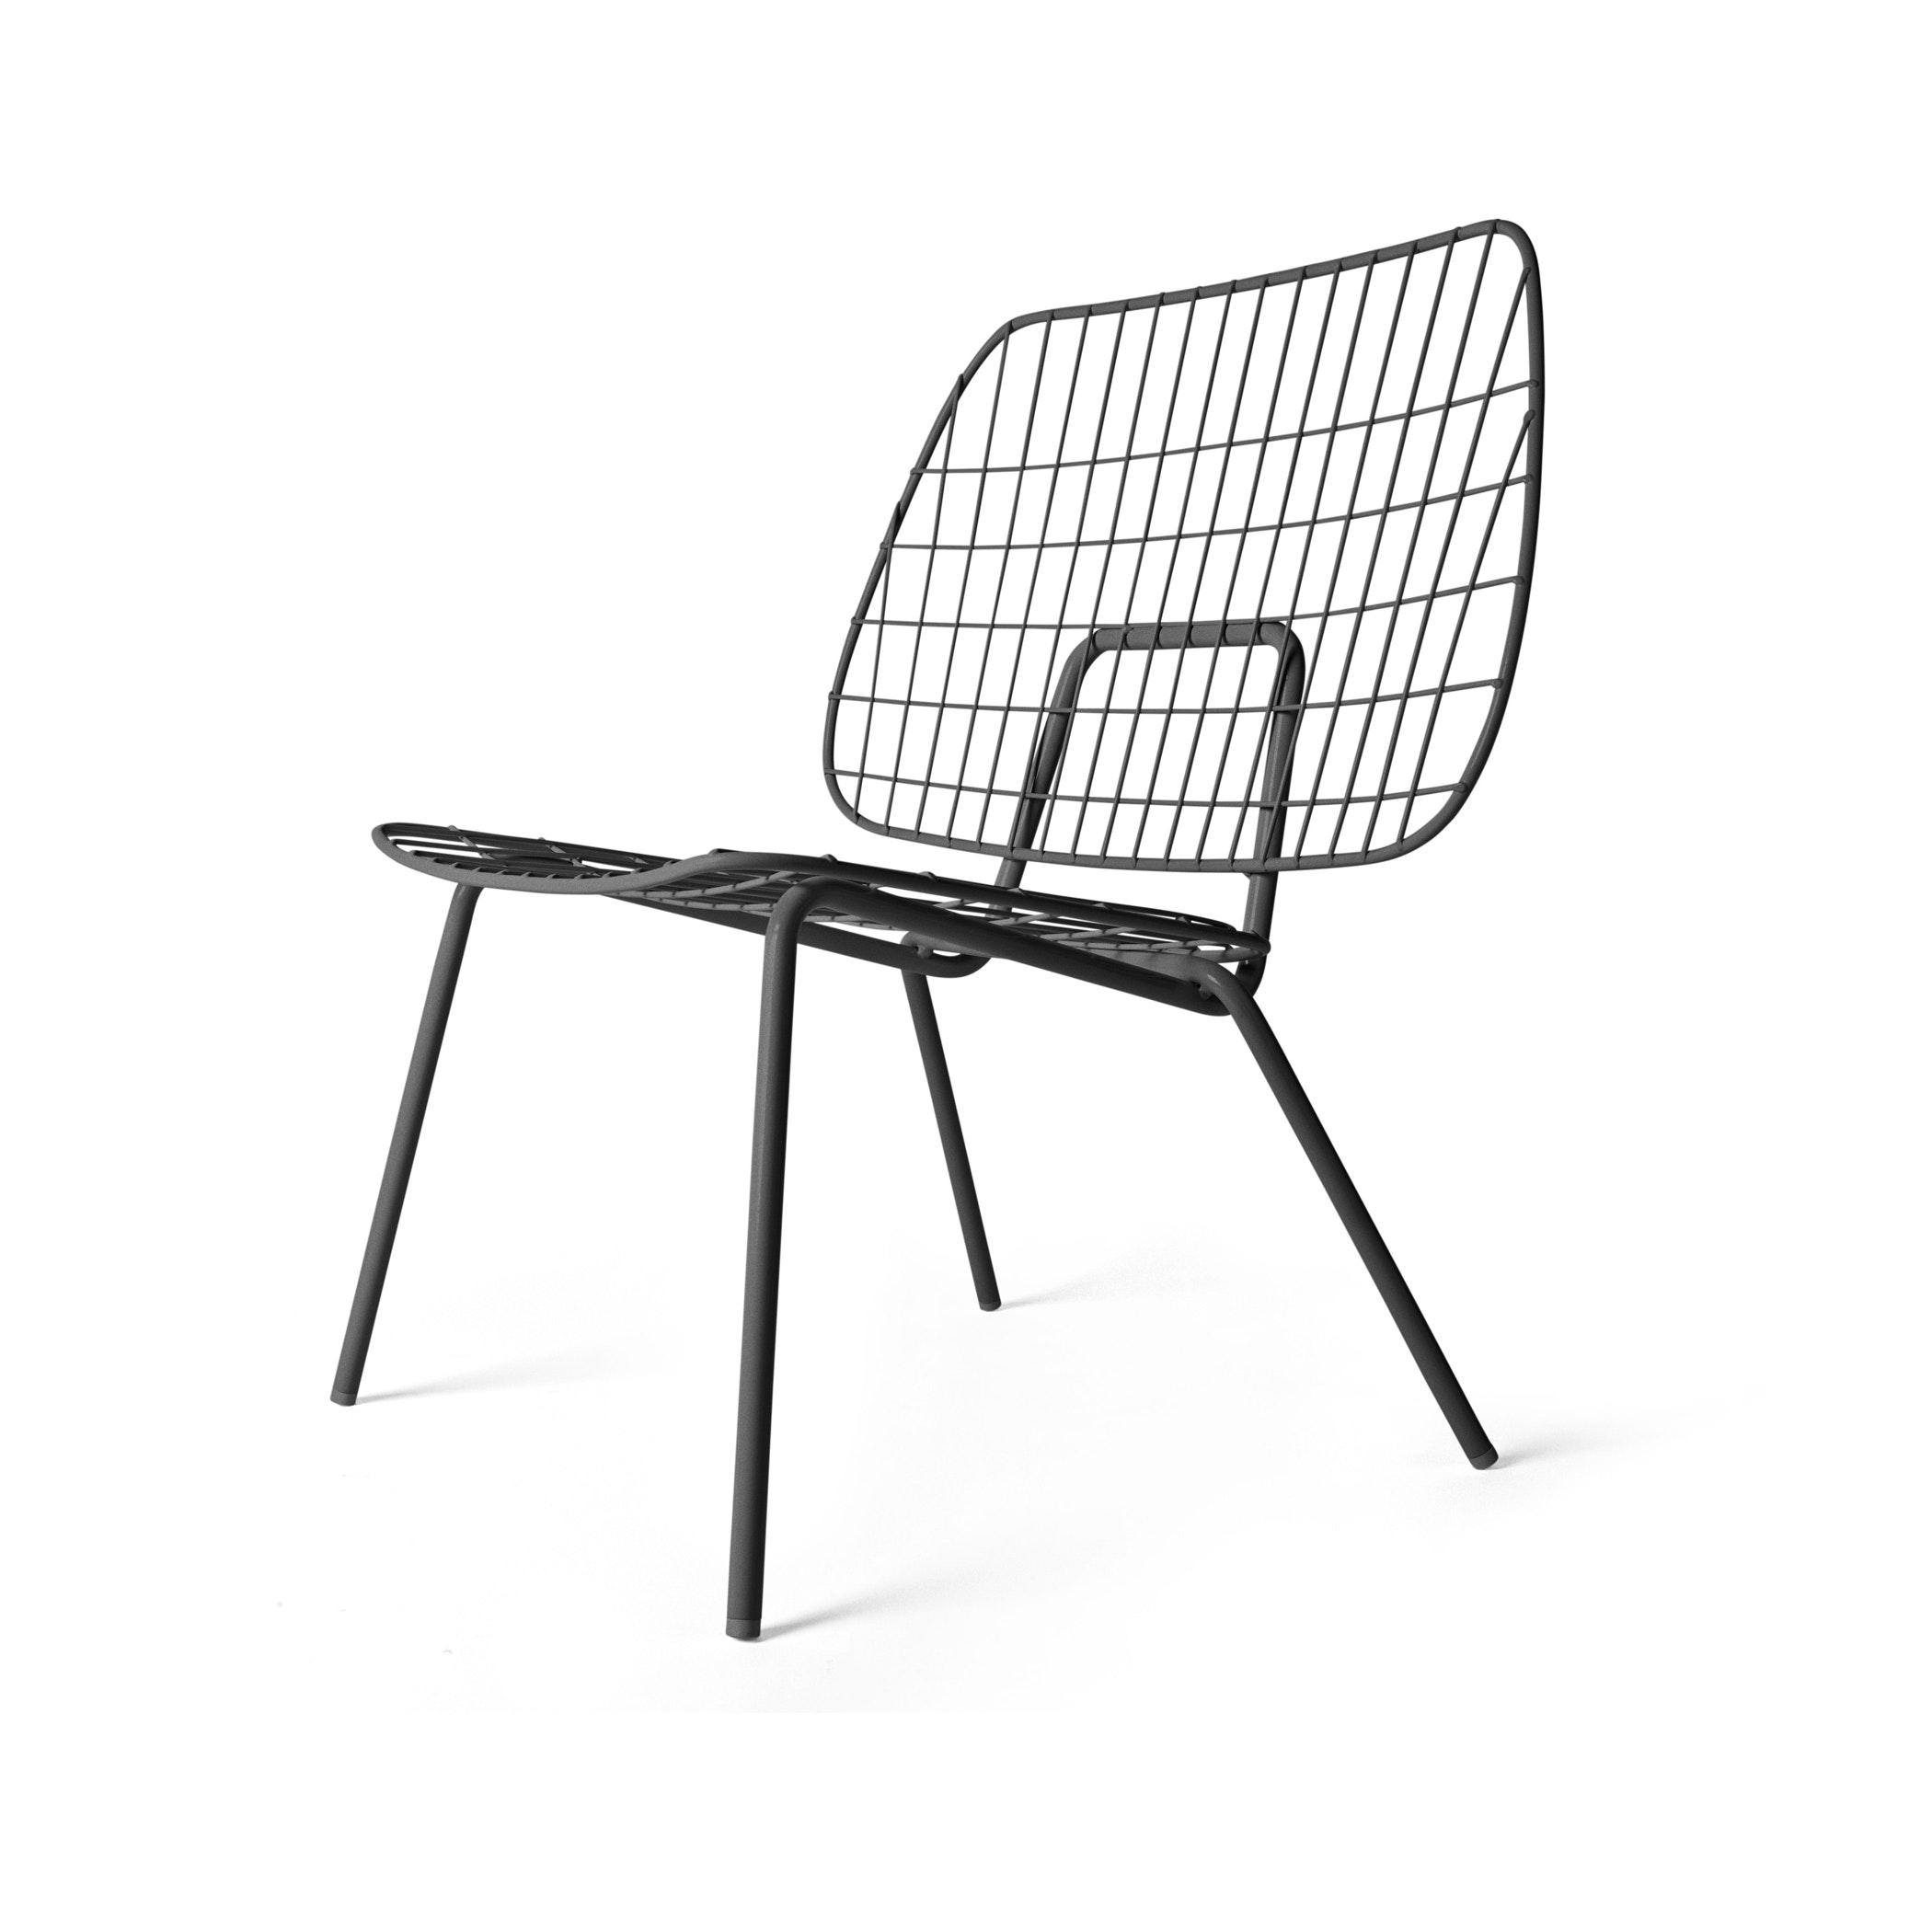 9500539 Wm String Lounge Chair Black 02 Download 72Dpi Jpg Rgb 290546